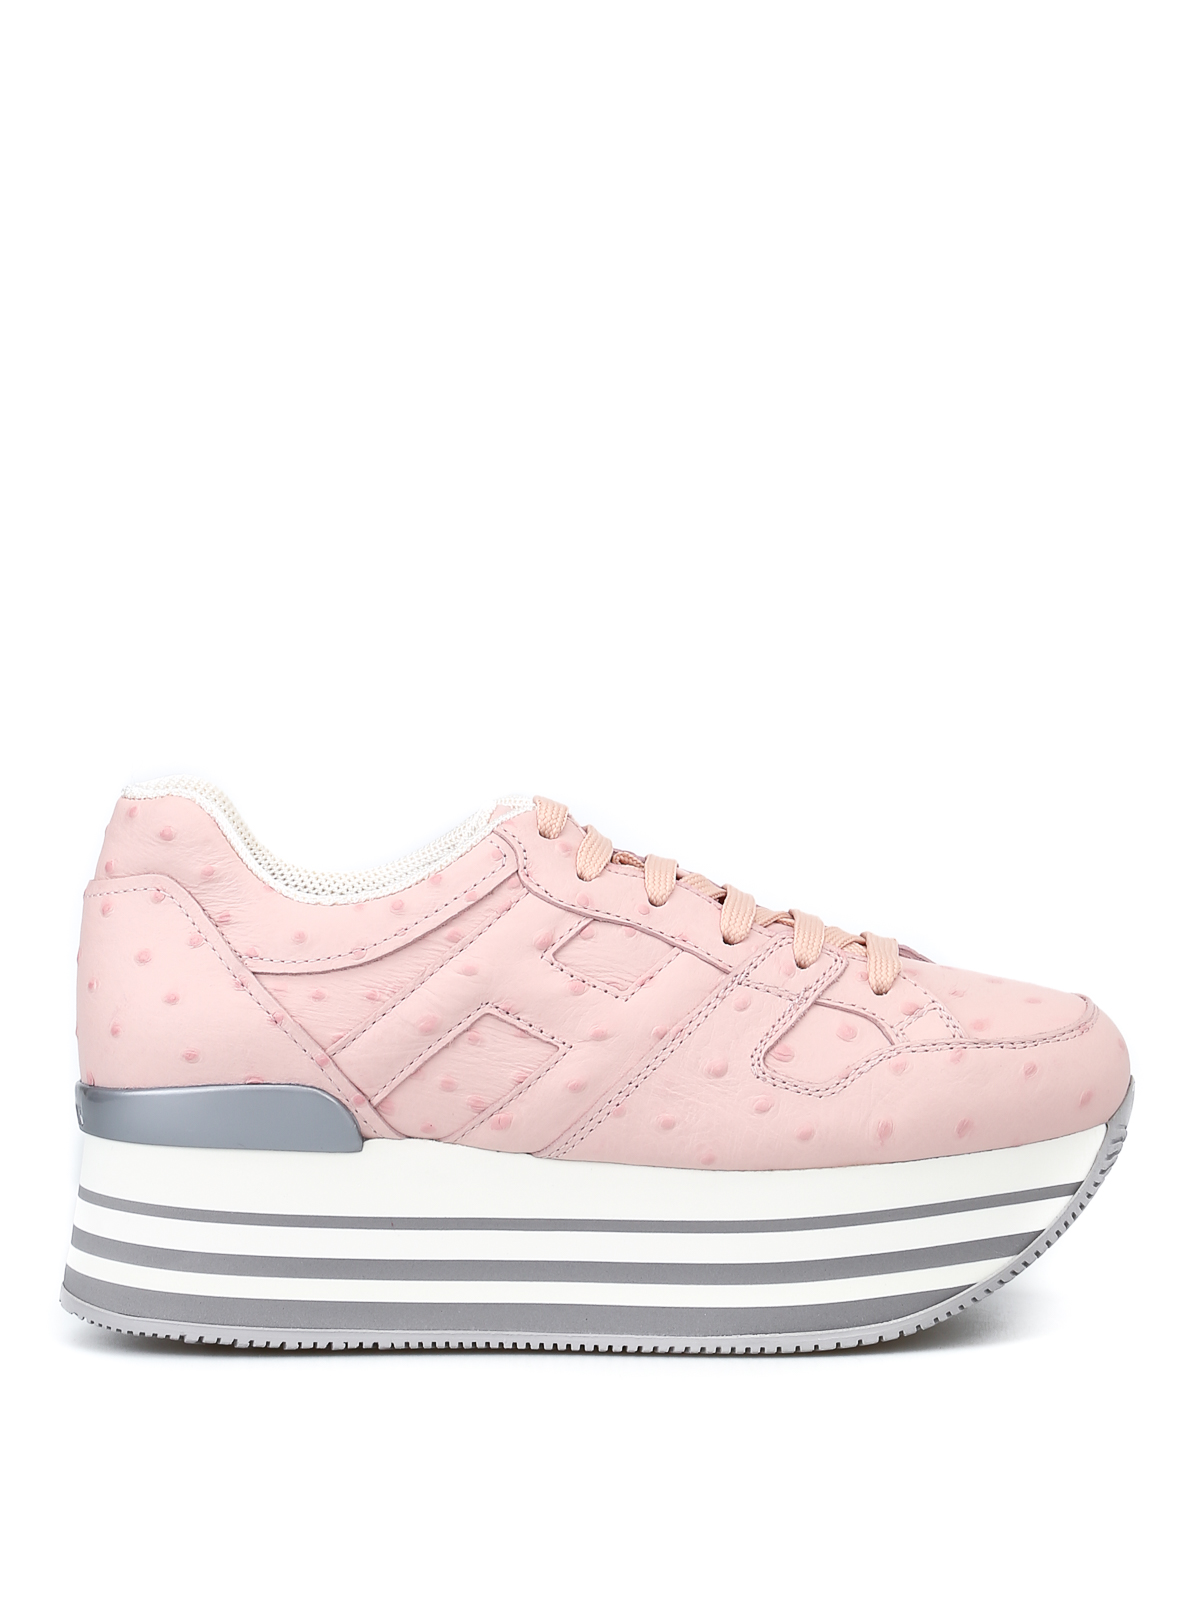 Hogan - Sneaker Maxi 222 stampa struzzo - sneakers - HXW2830T548I9FM413 0bf0e1d3d3d